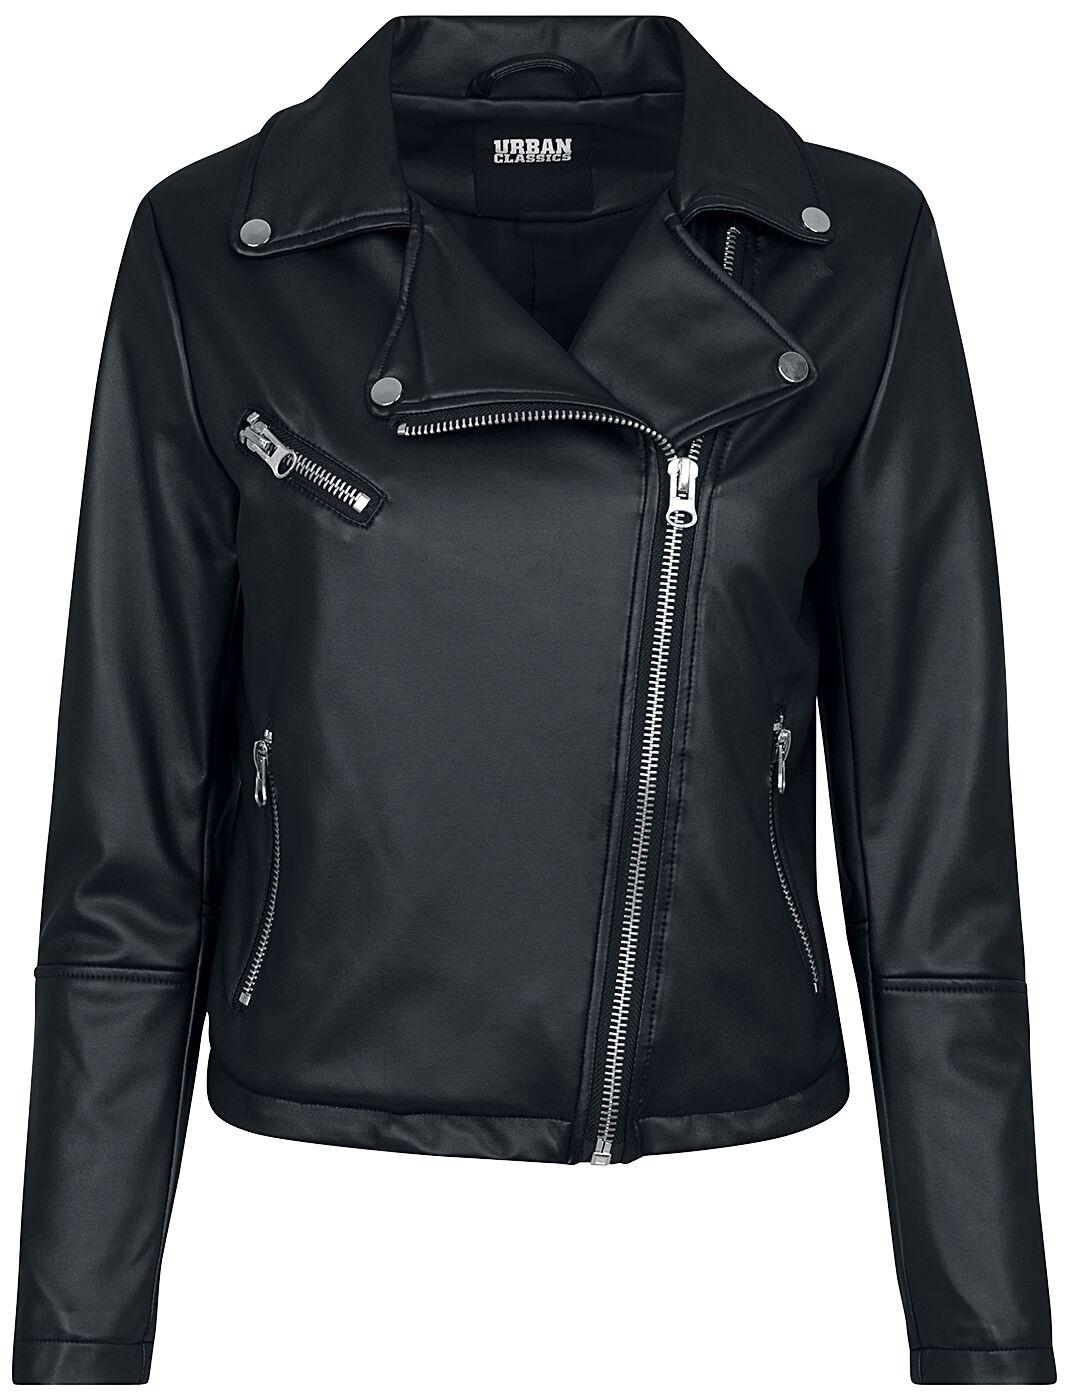 Image of   Urban Classics Ladies Faux Leather Biker Jacket Girlie jakke sort